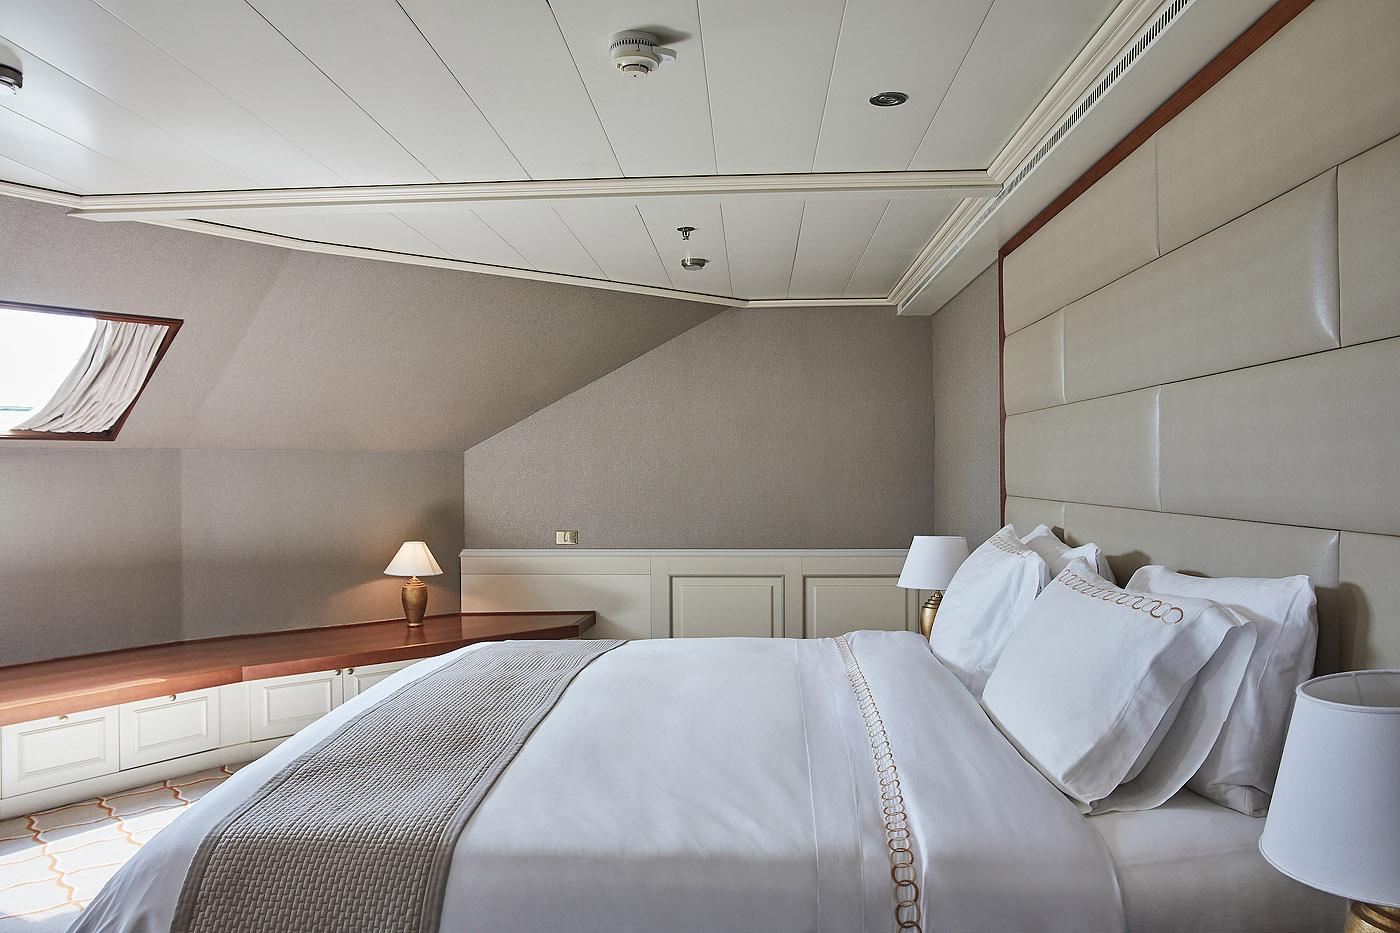 Grand Suite G1 / G2 2 Schlafzimmer - Silver Whisper - Bild 2 - Thumb